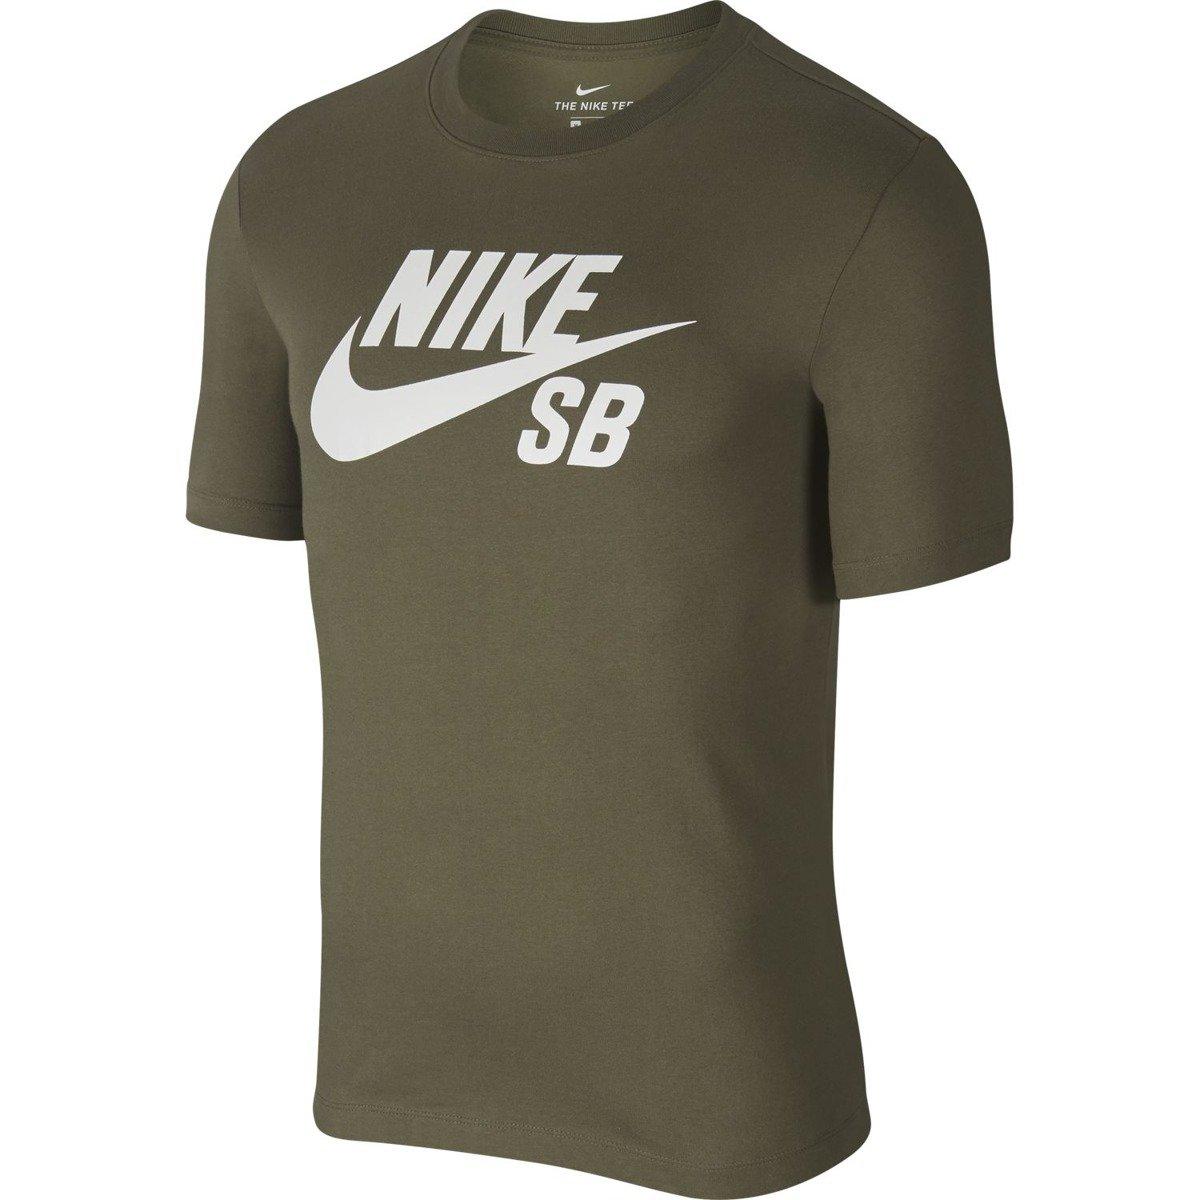 296547057 nike sb dry tee dfct logo Medium Olive/white green | Clothes \ T-shirts \ T- Shirts Brands \ Nike SB | Skateshop Miniramp.pl